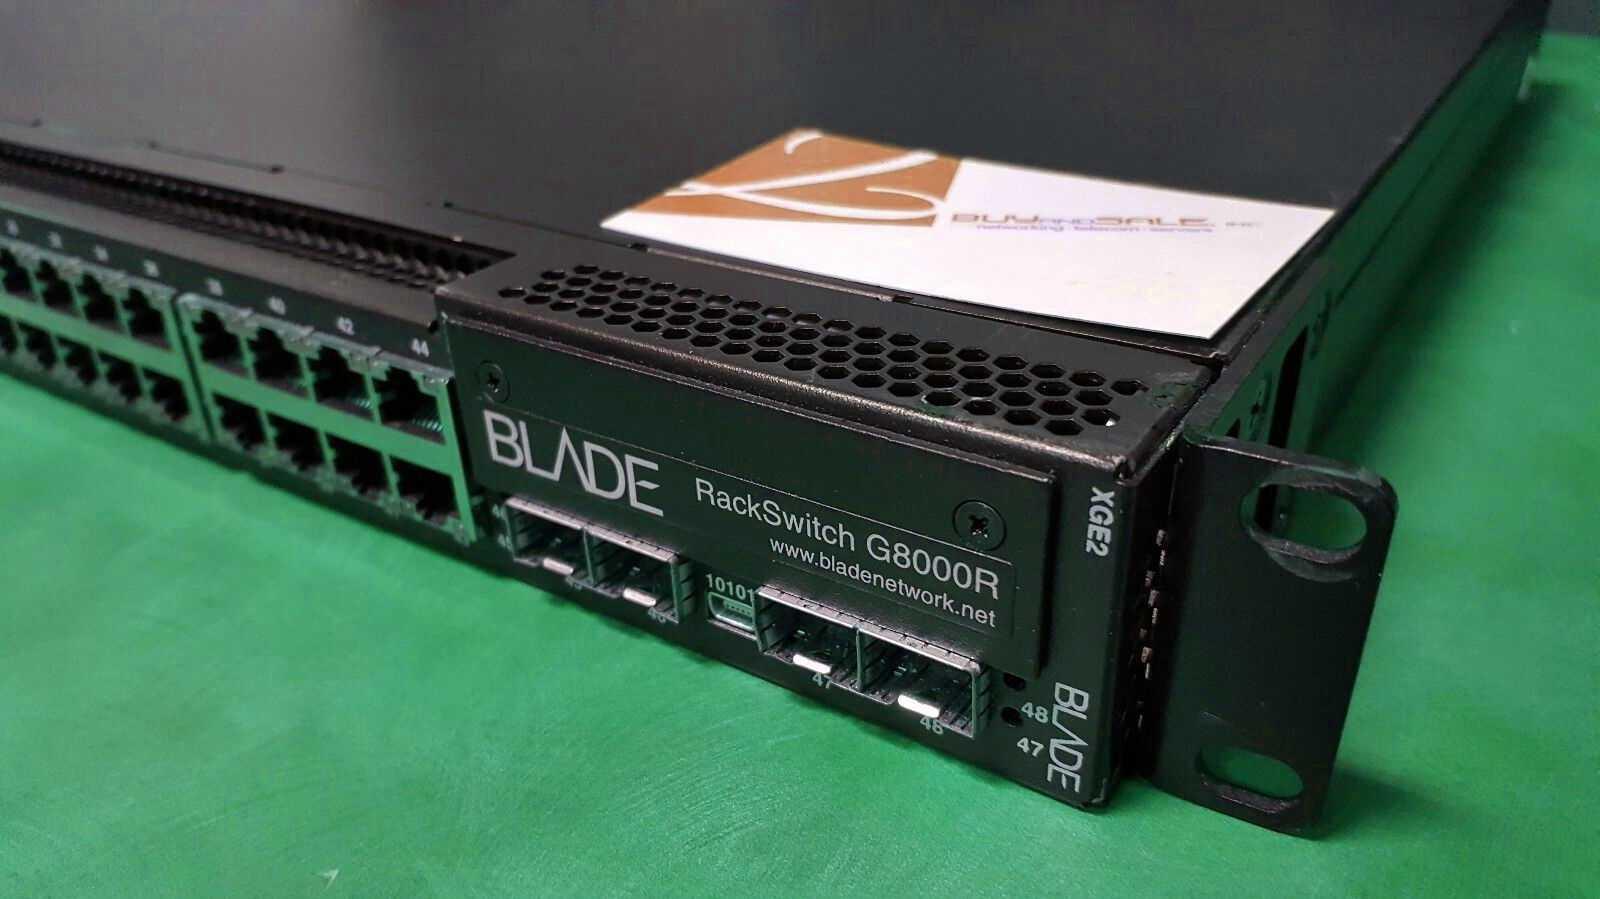 Lenovo findet Backdoor in eigenen Netzwerk-Switches